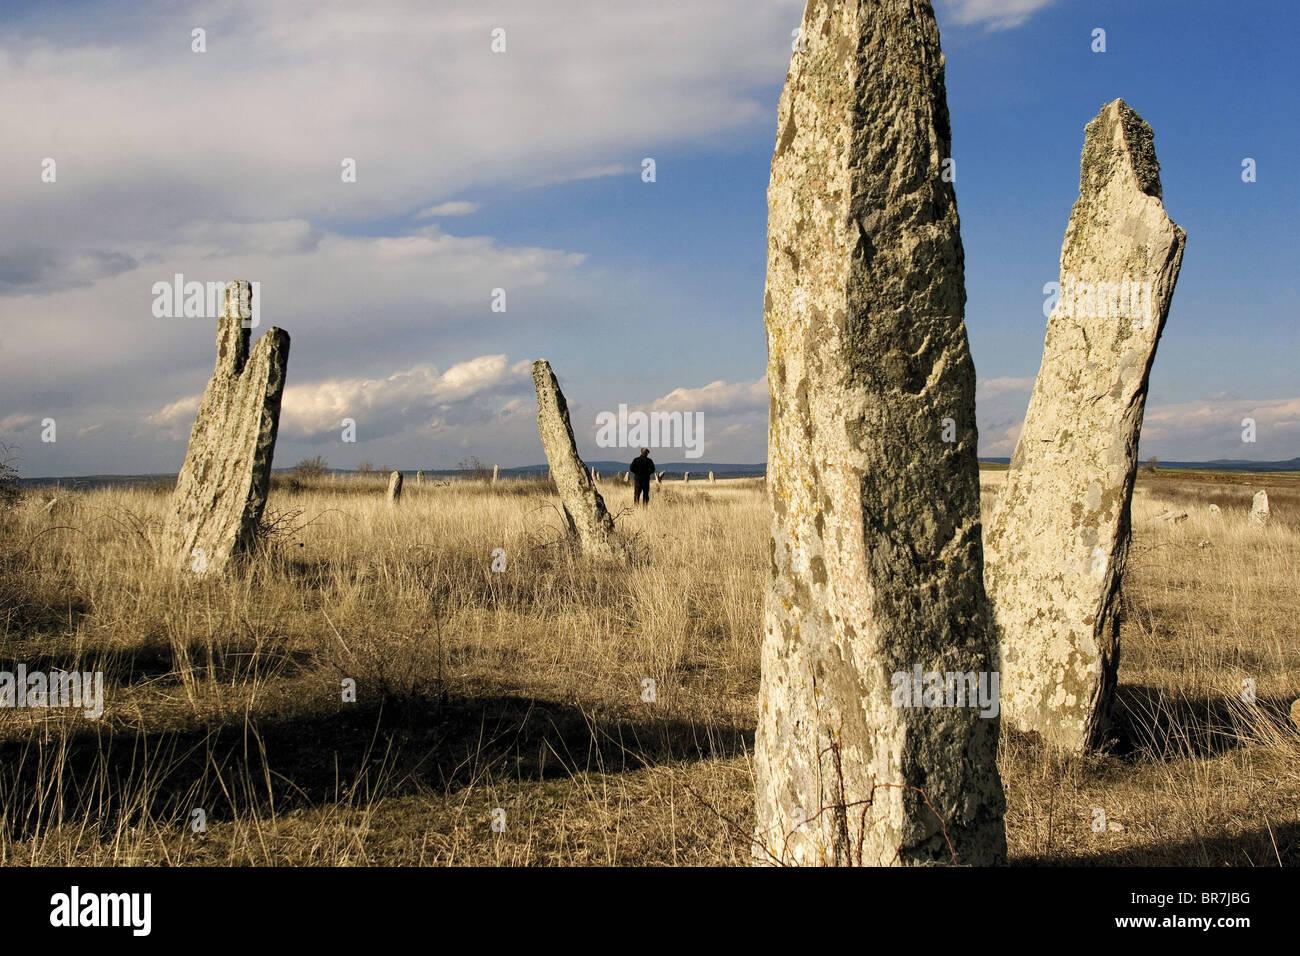 Alten Dolmen in Thrakien Türkei Stockbild